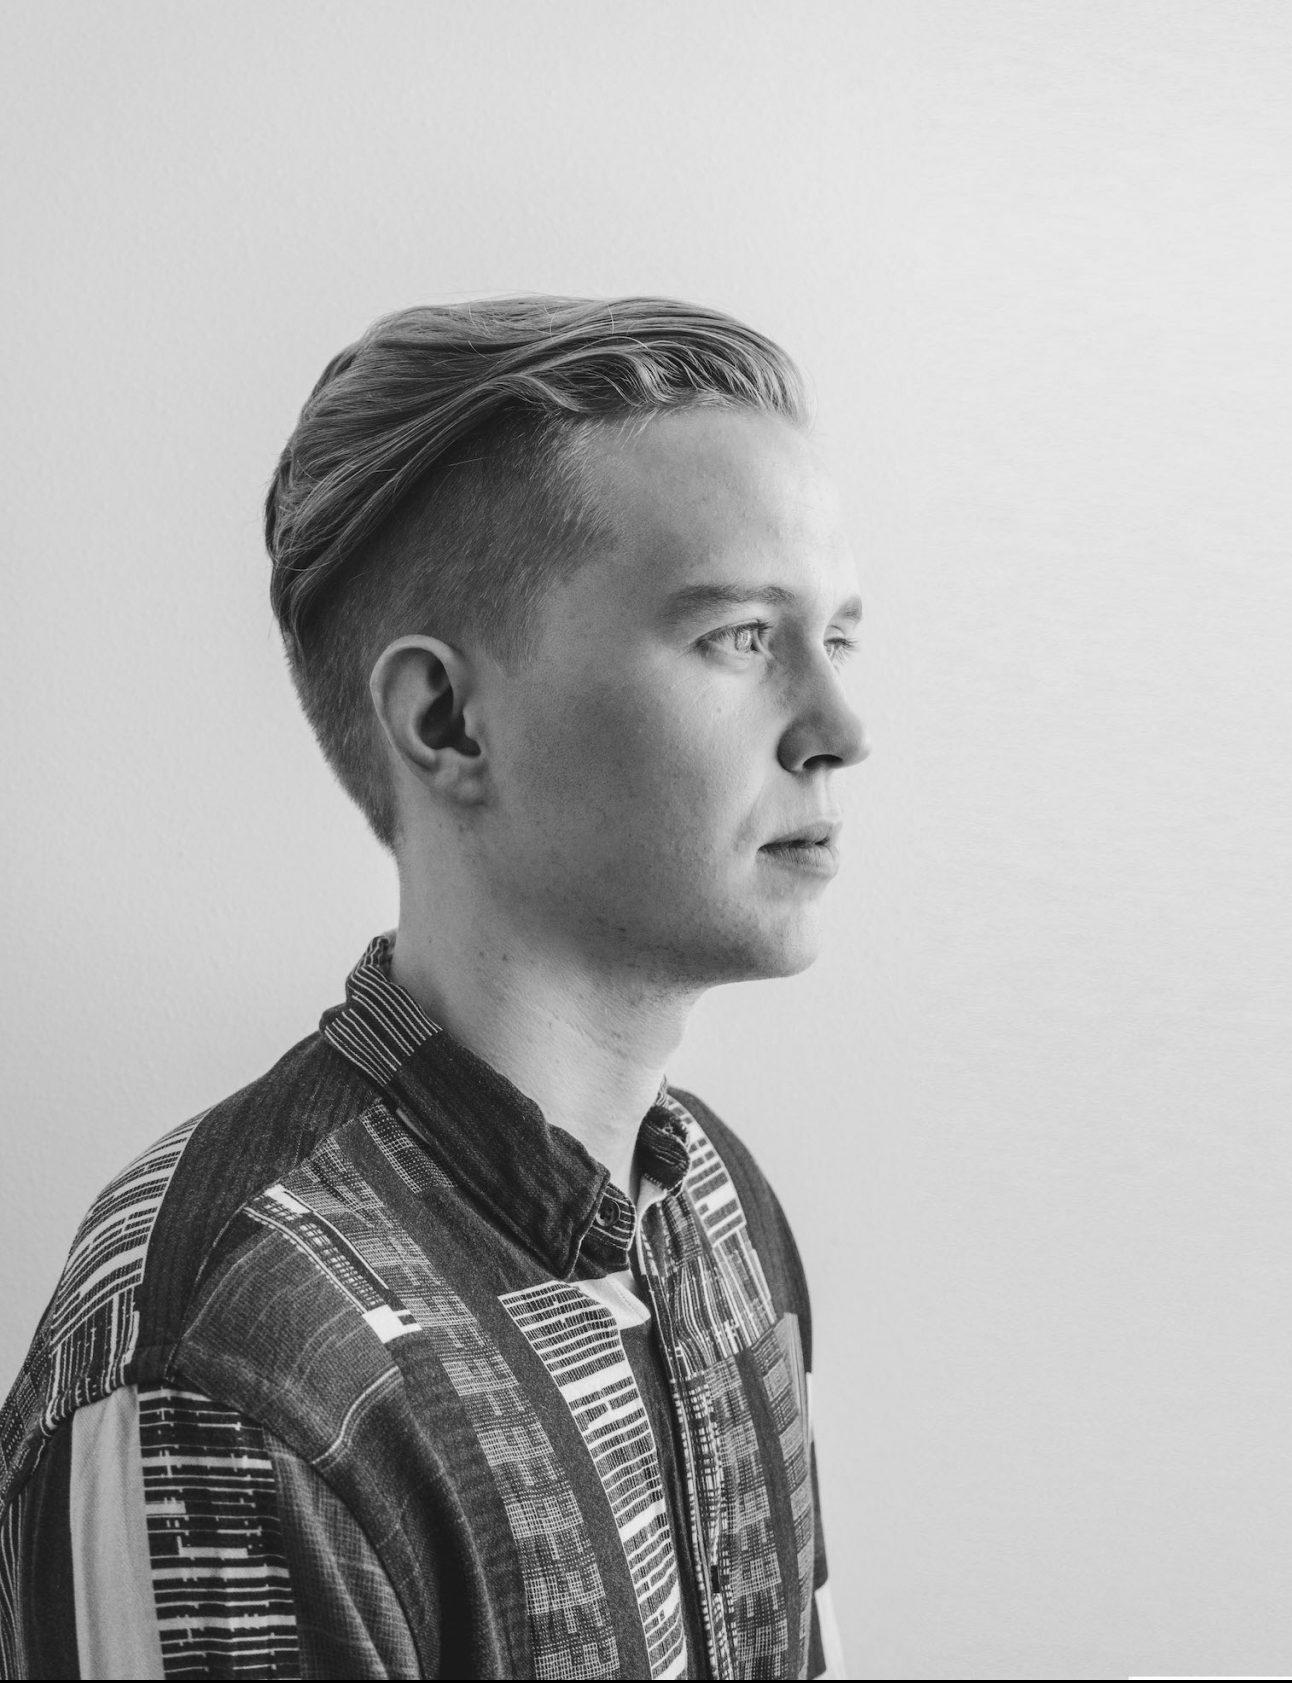 Gulli Bjornsson